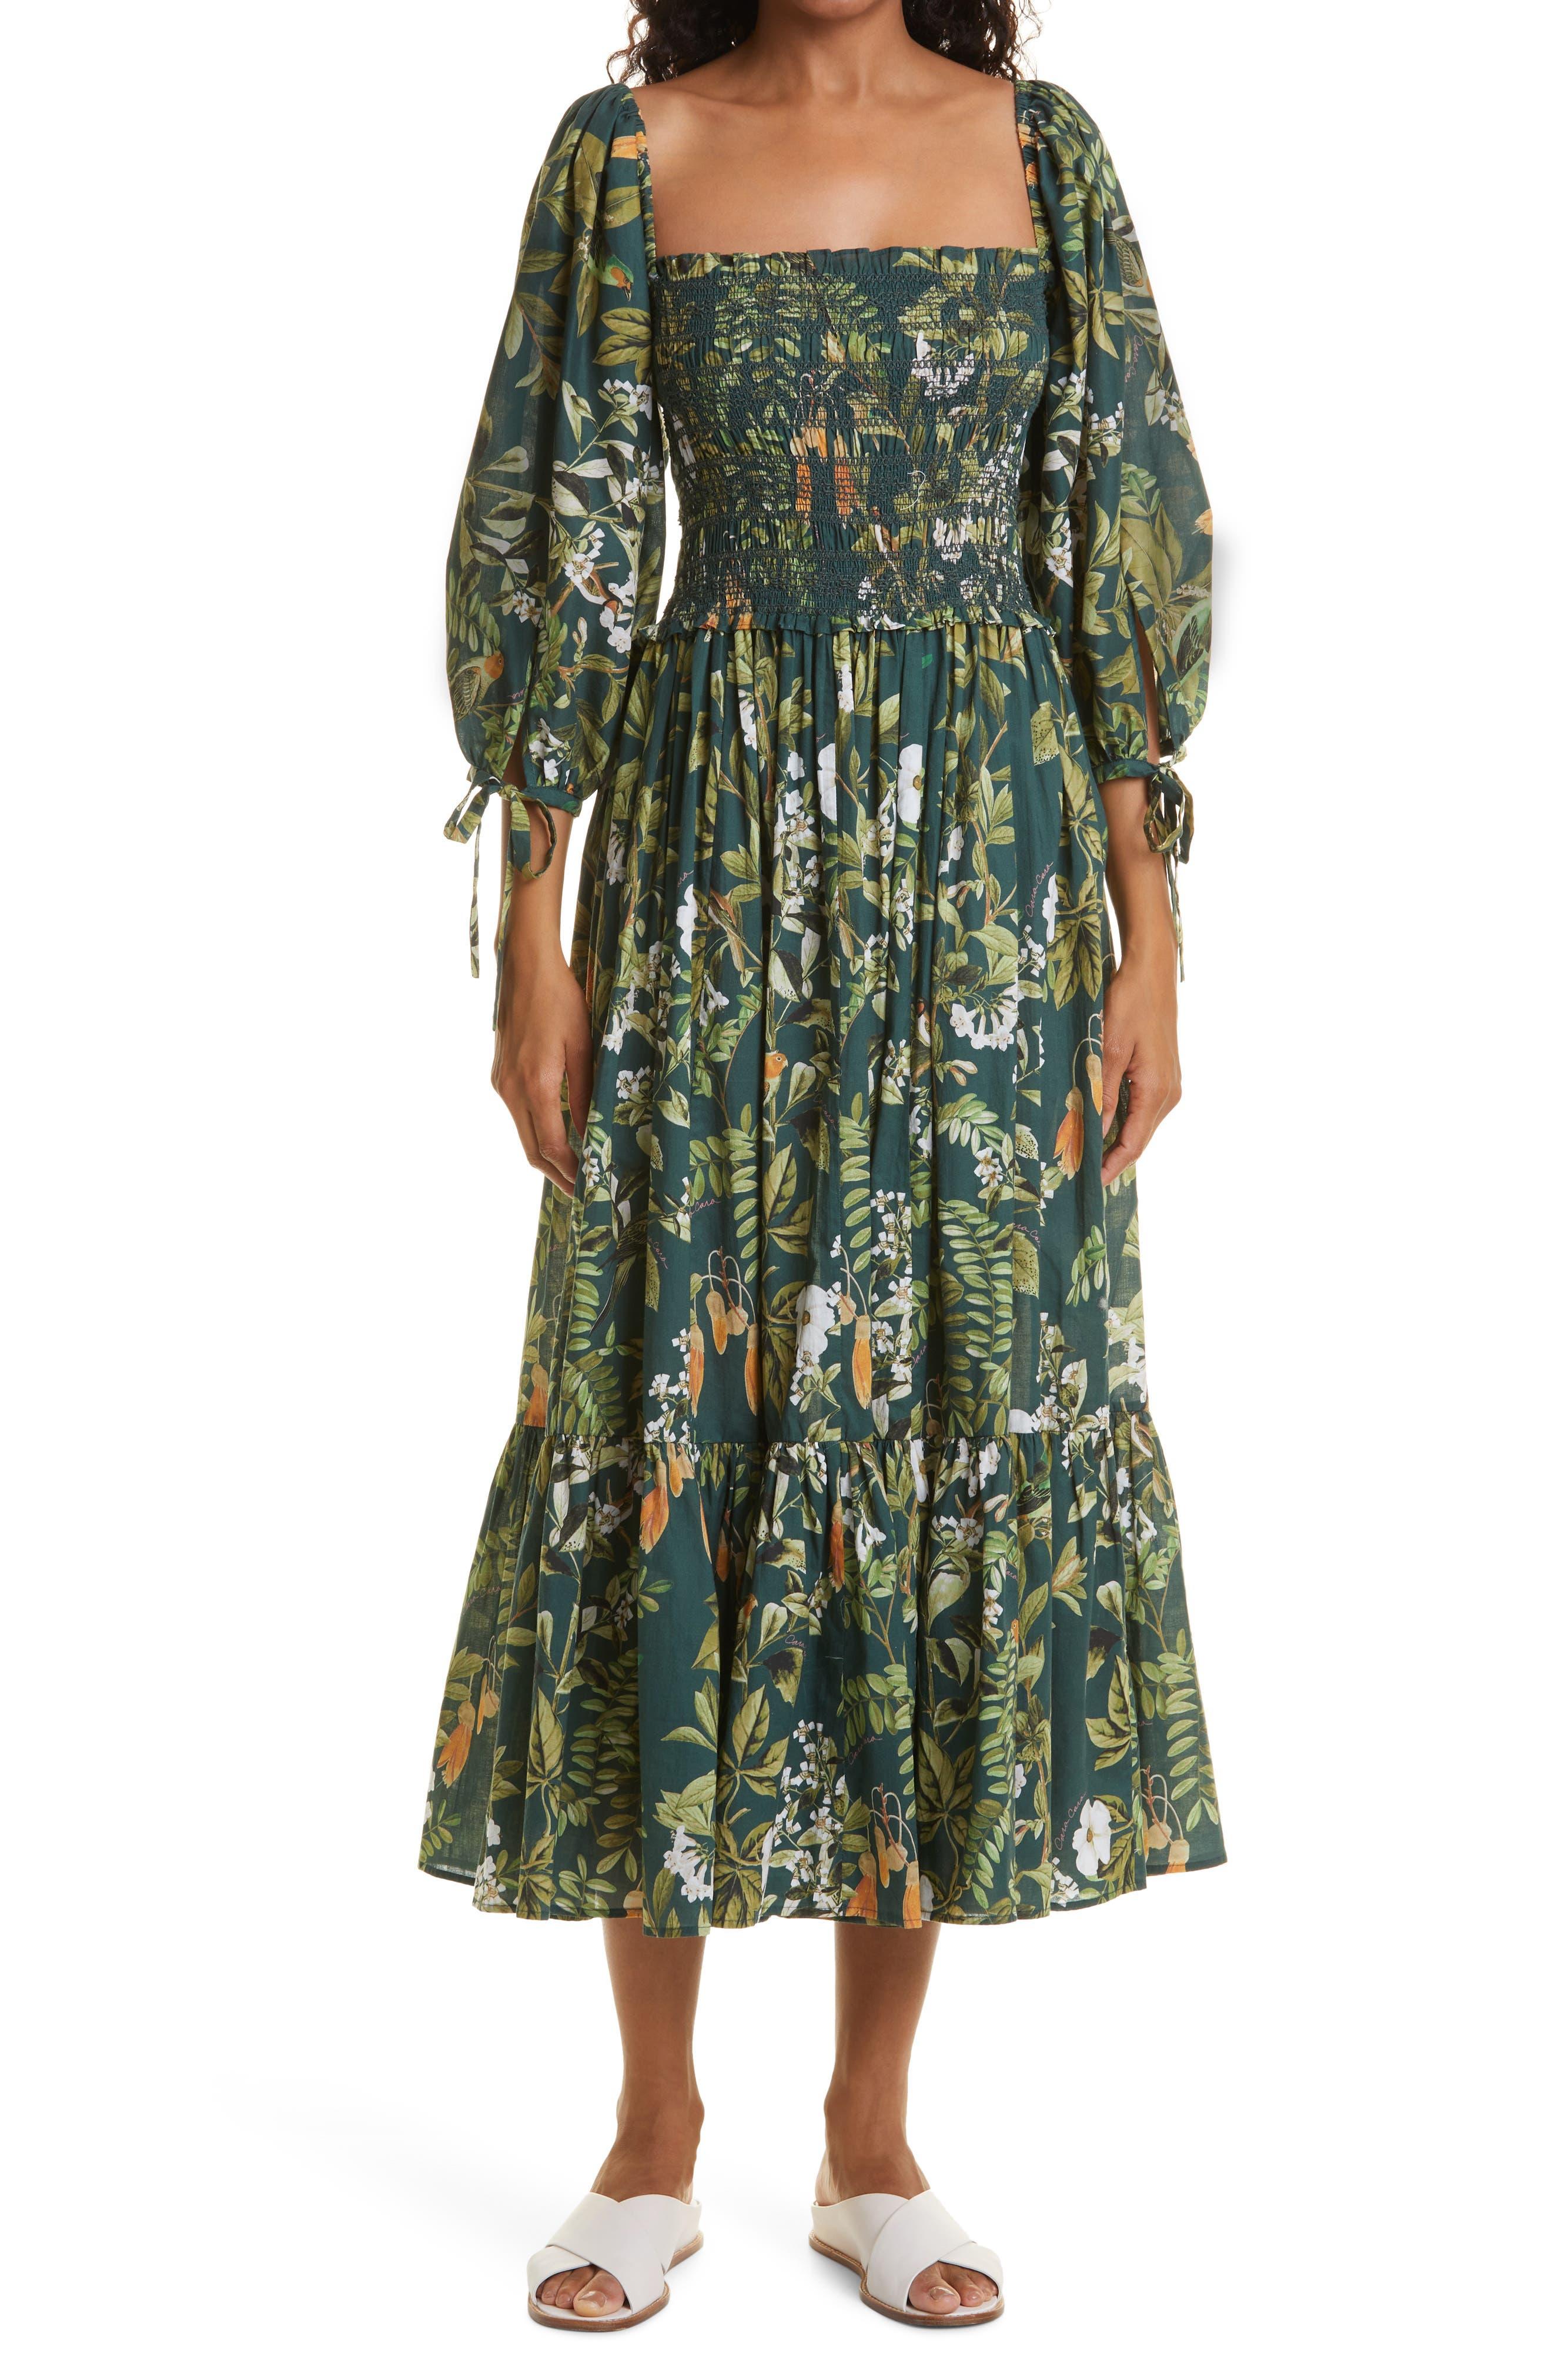 Jazzy Botanical Print Cotton Voile Dress